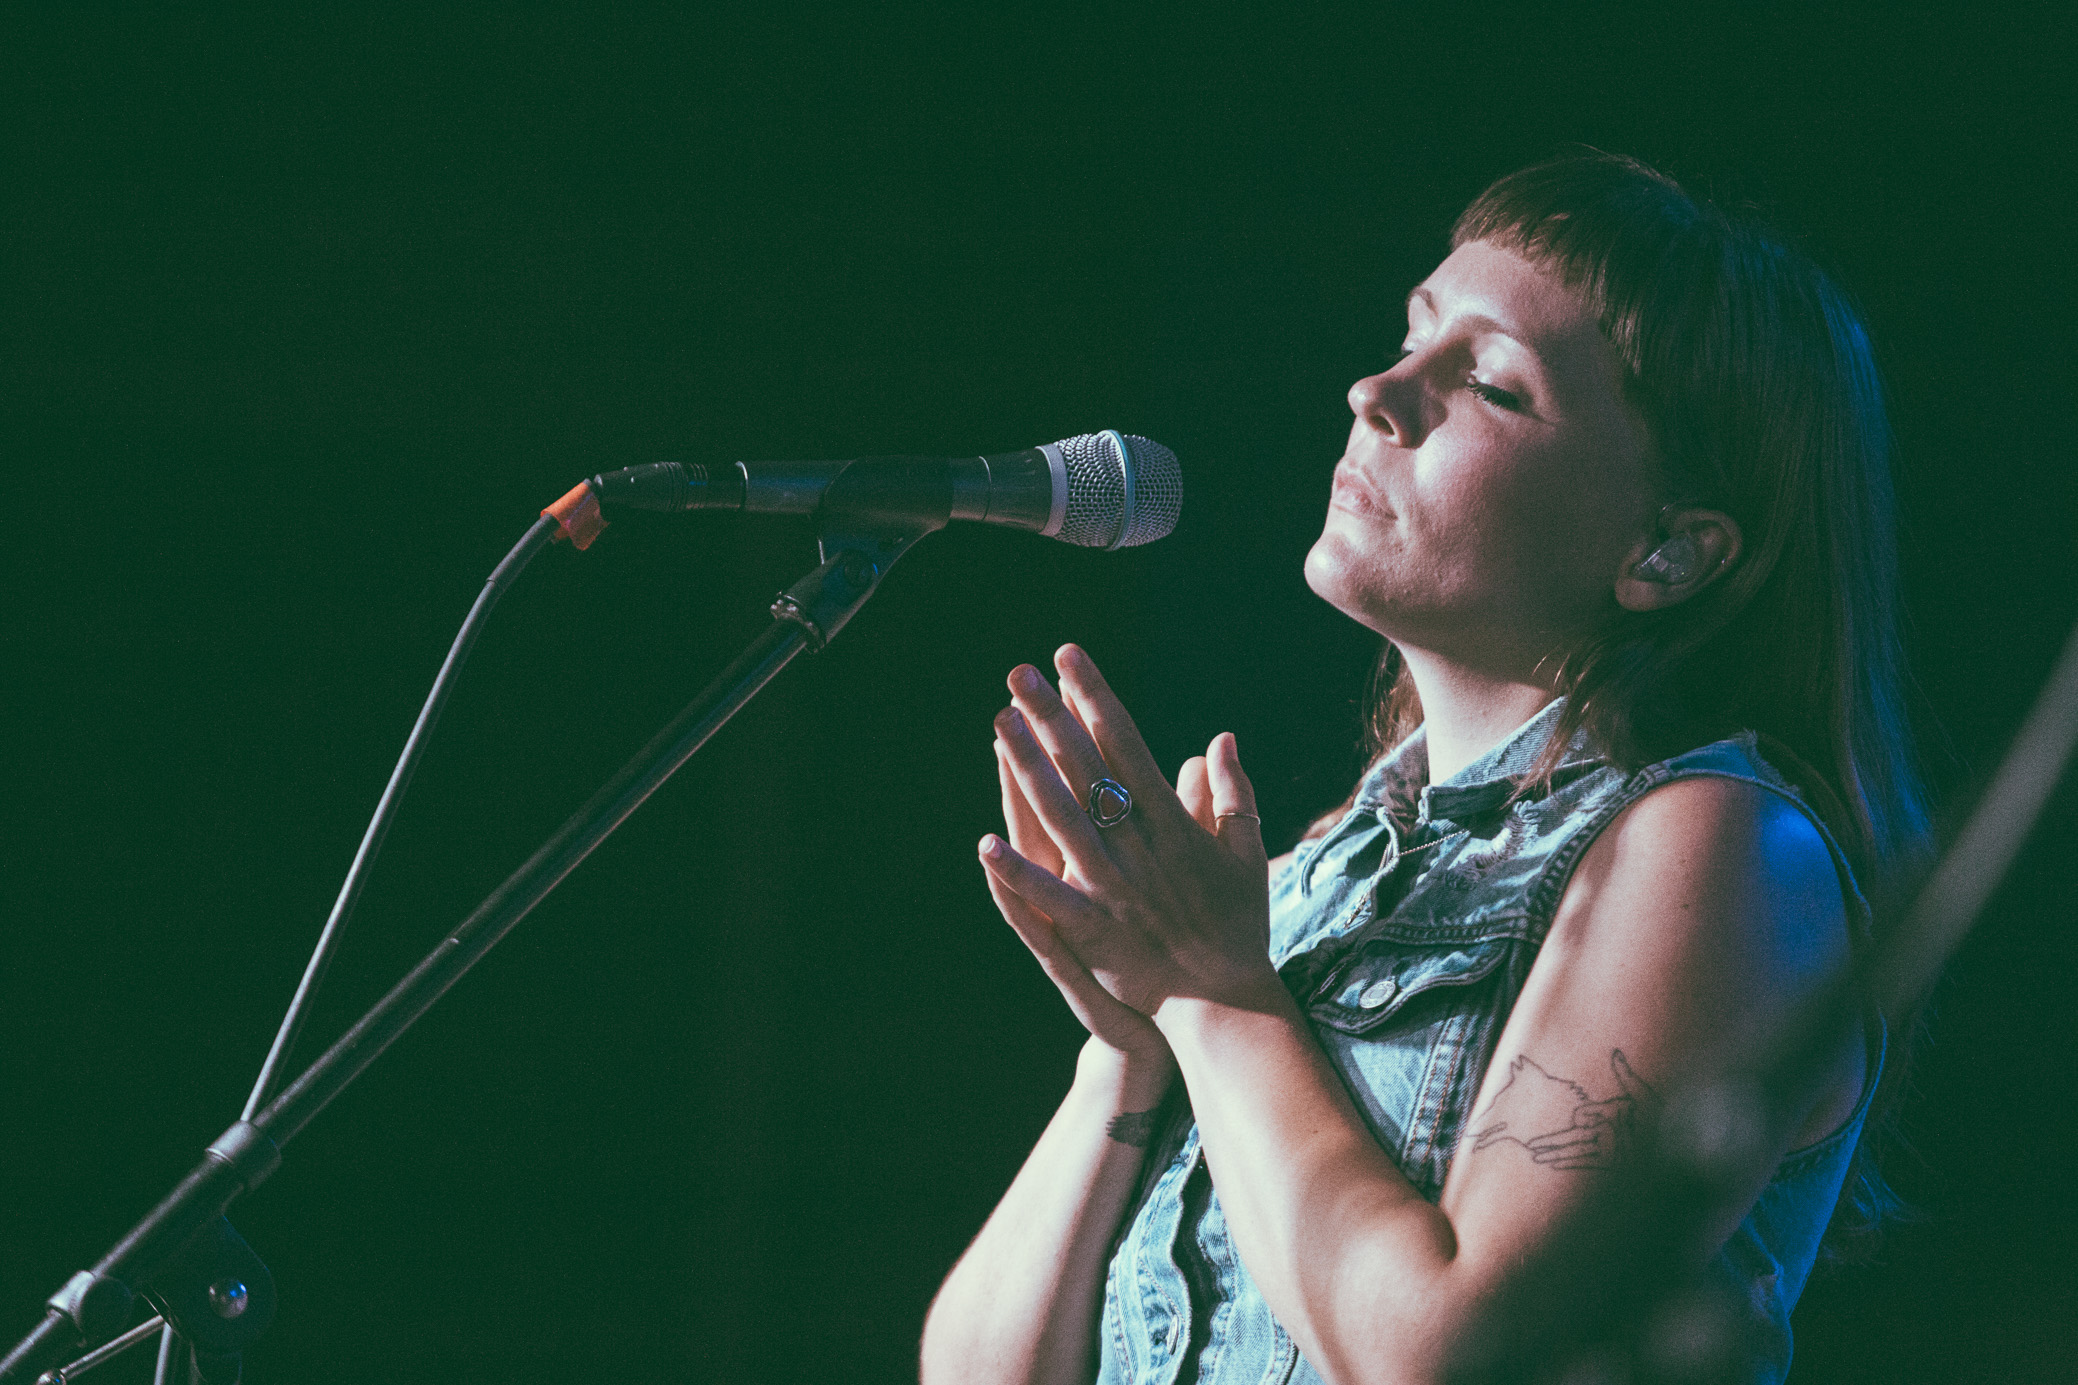 Allison Closner of Joseph performs in concert at Saturn Birmingham in Birmingham, Alabama on September 6th, 2018. (Photo by David A. Smith/DSmithScenes)